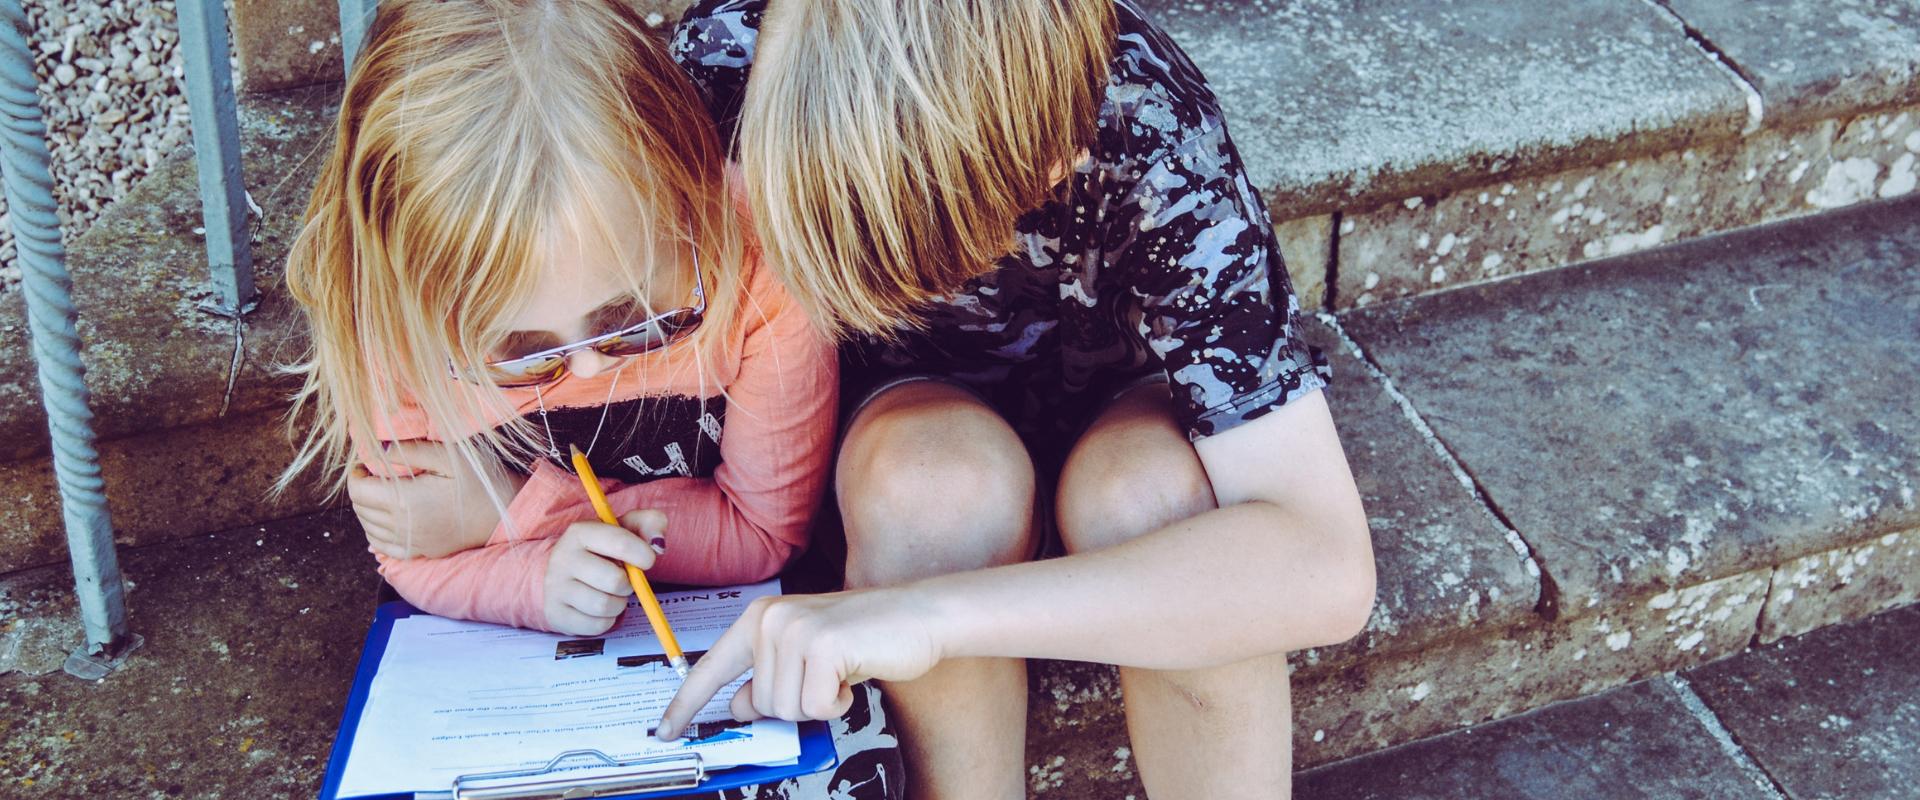 TalentIndex trainingen opleidingen kindverzorgers kinderdagverblijven